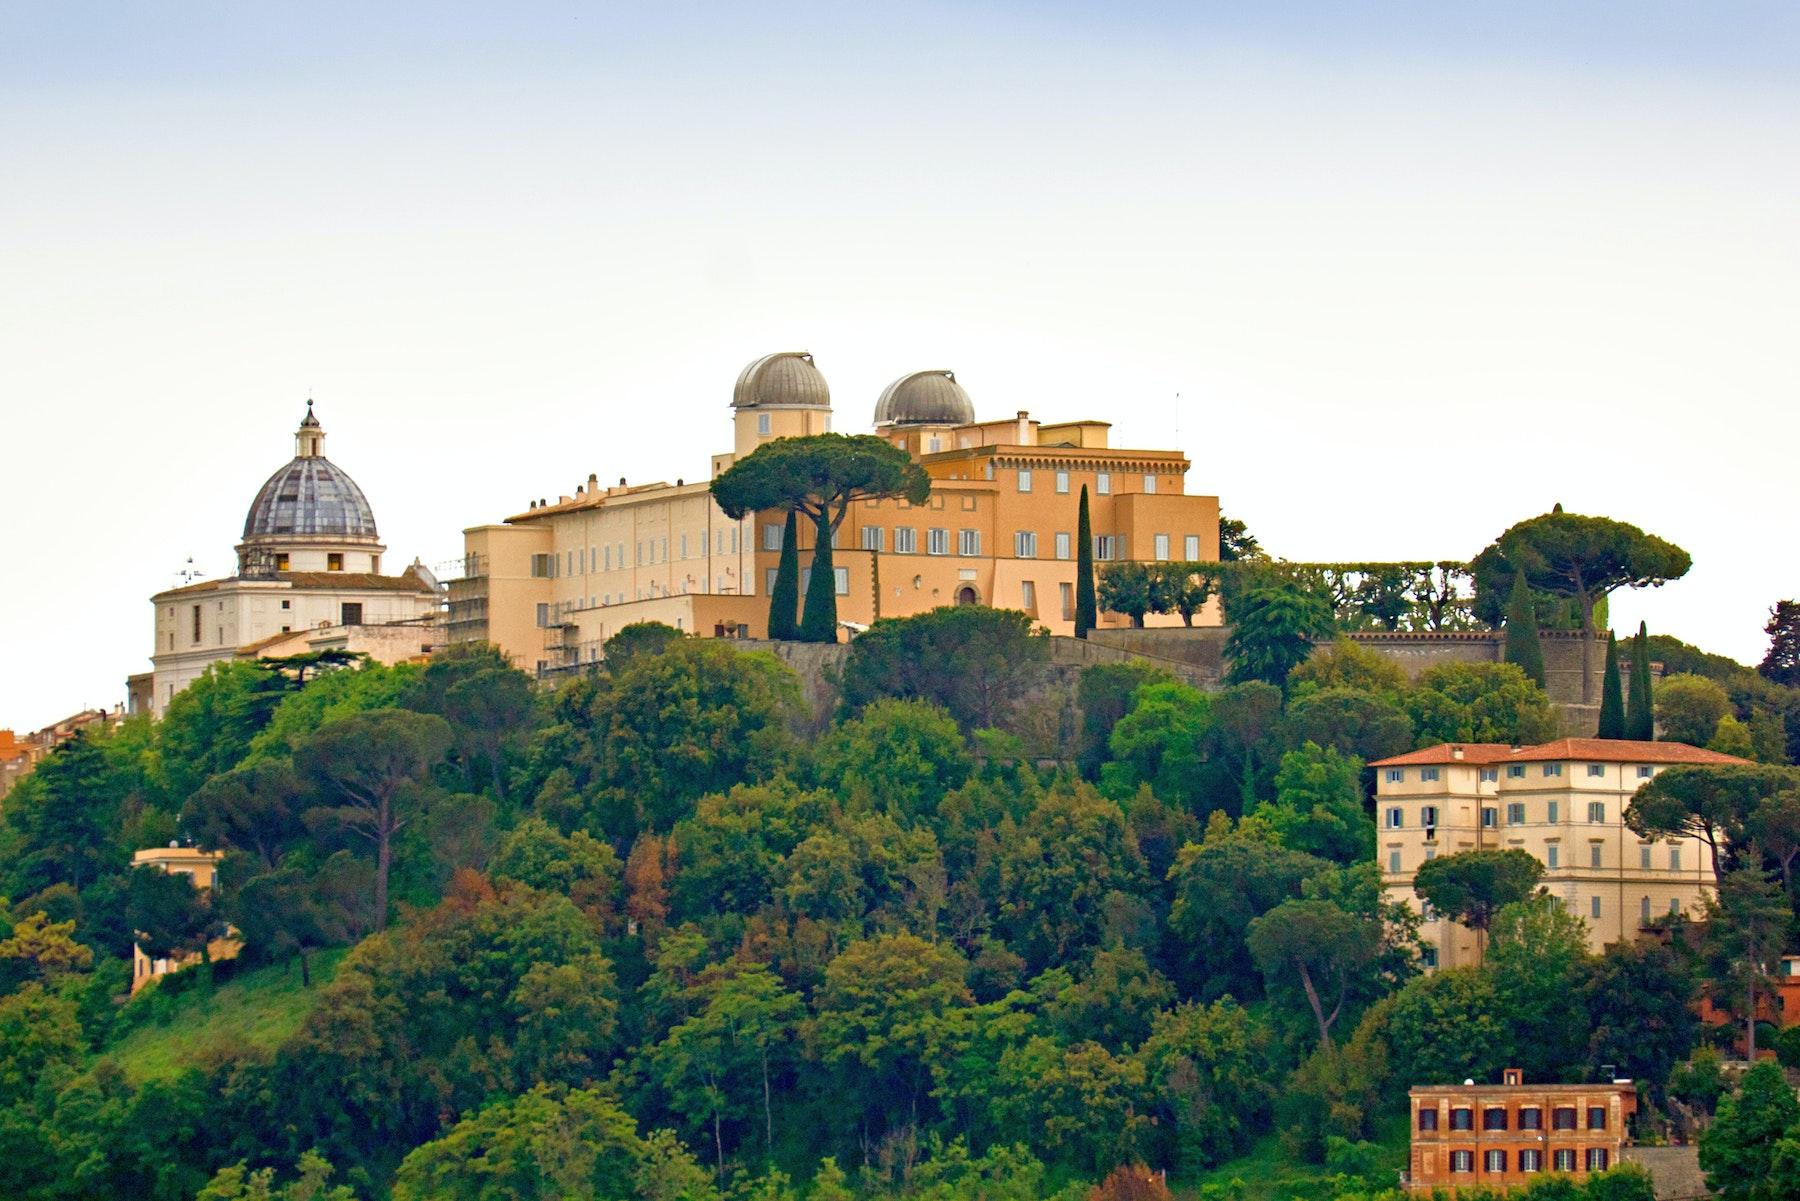 papal palace of castel gandolfo